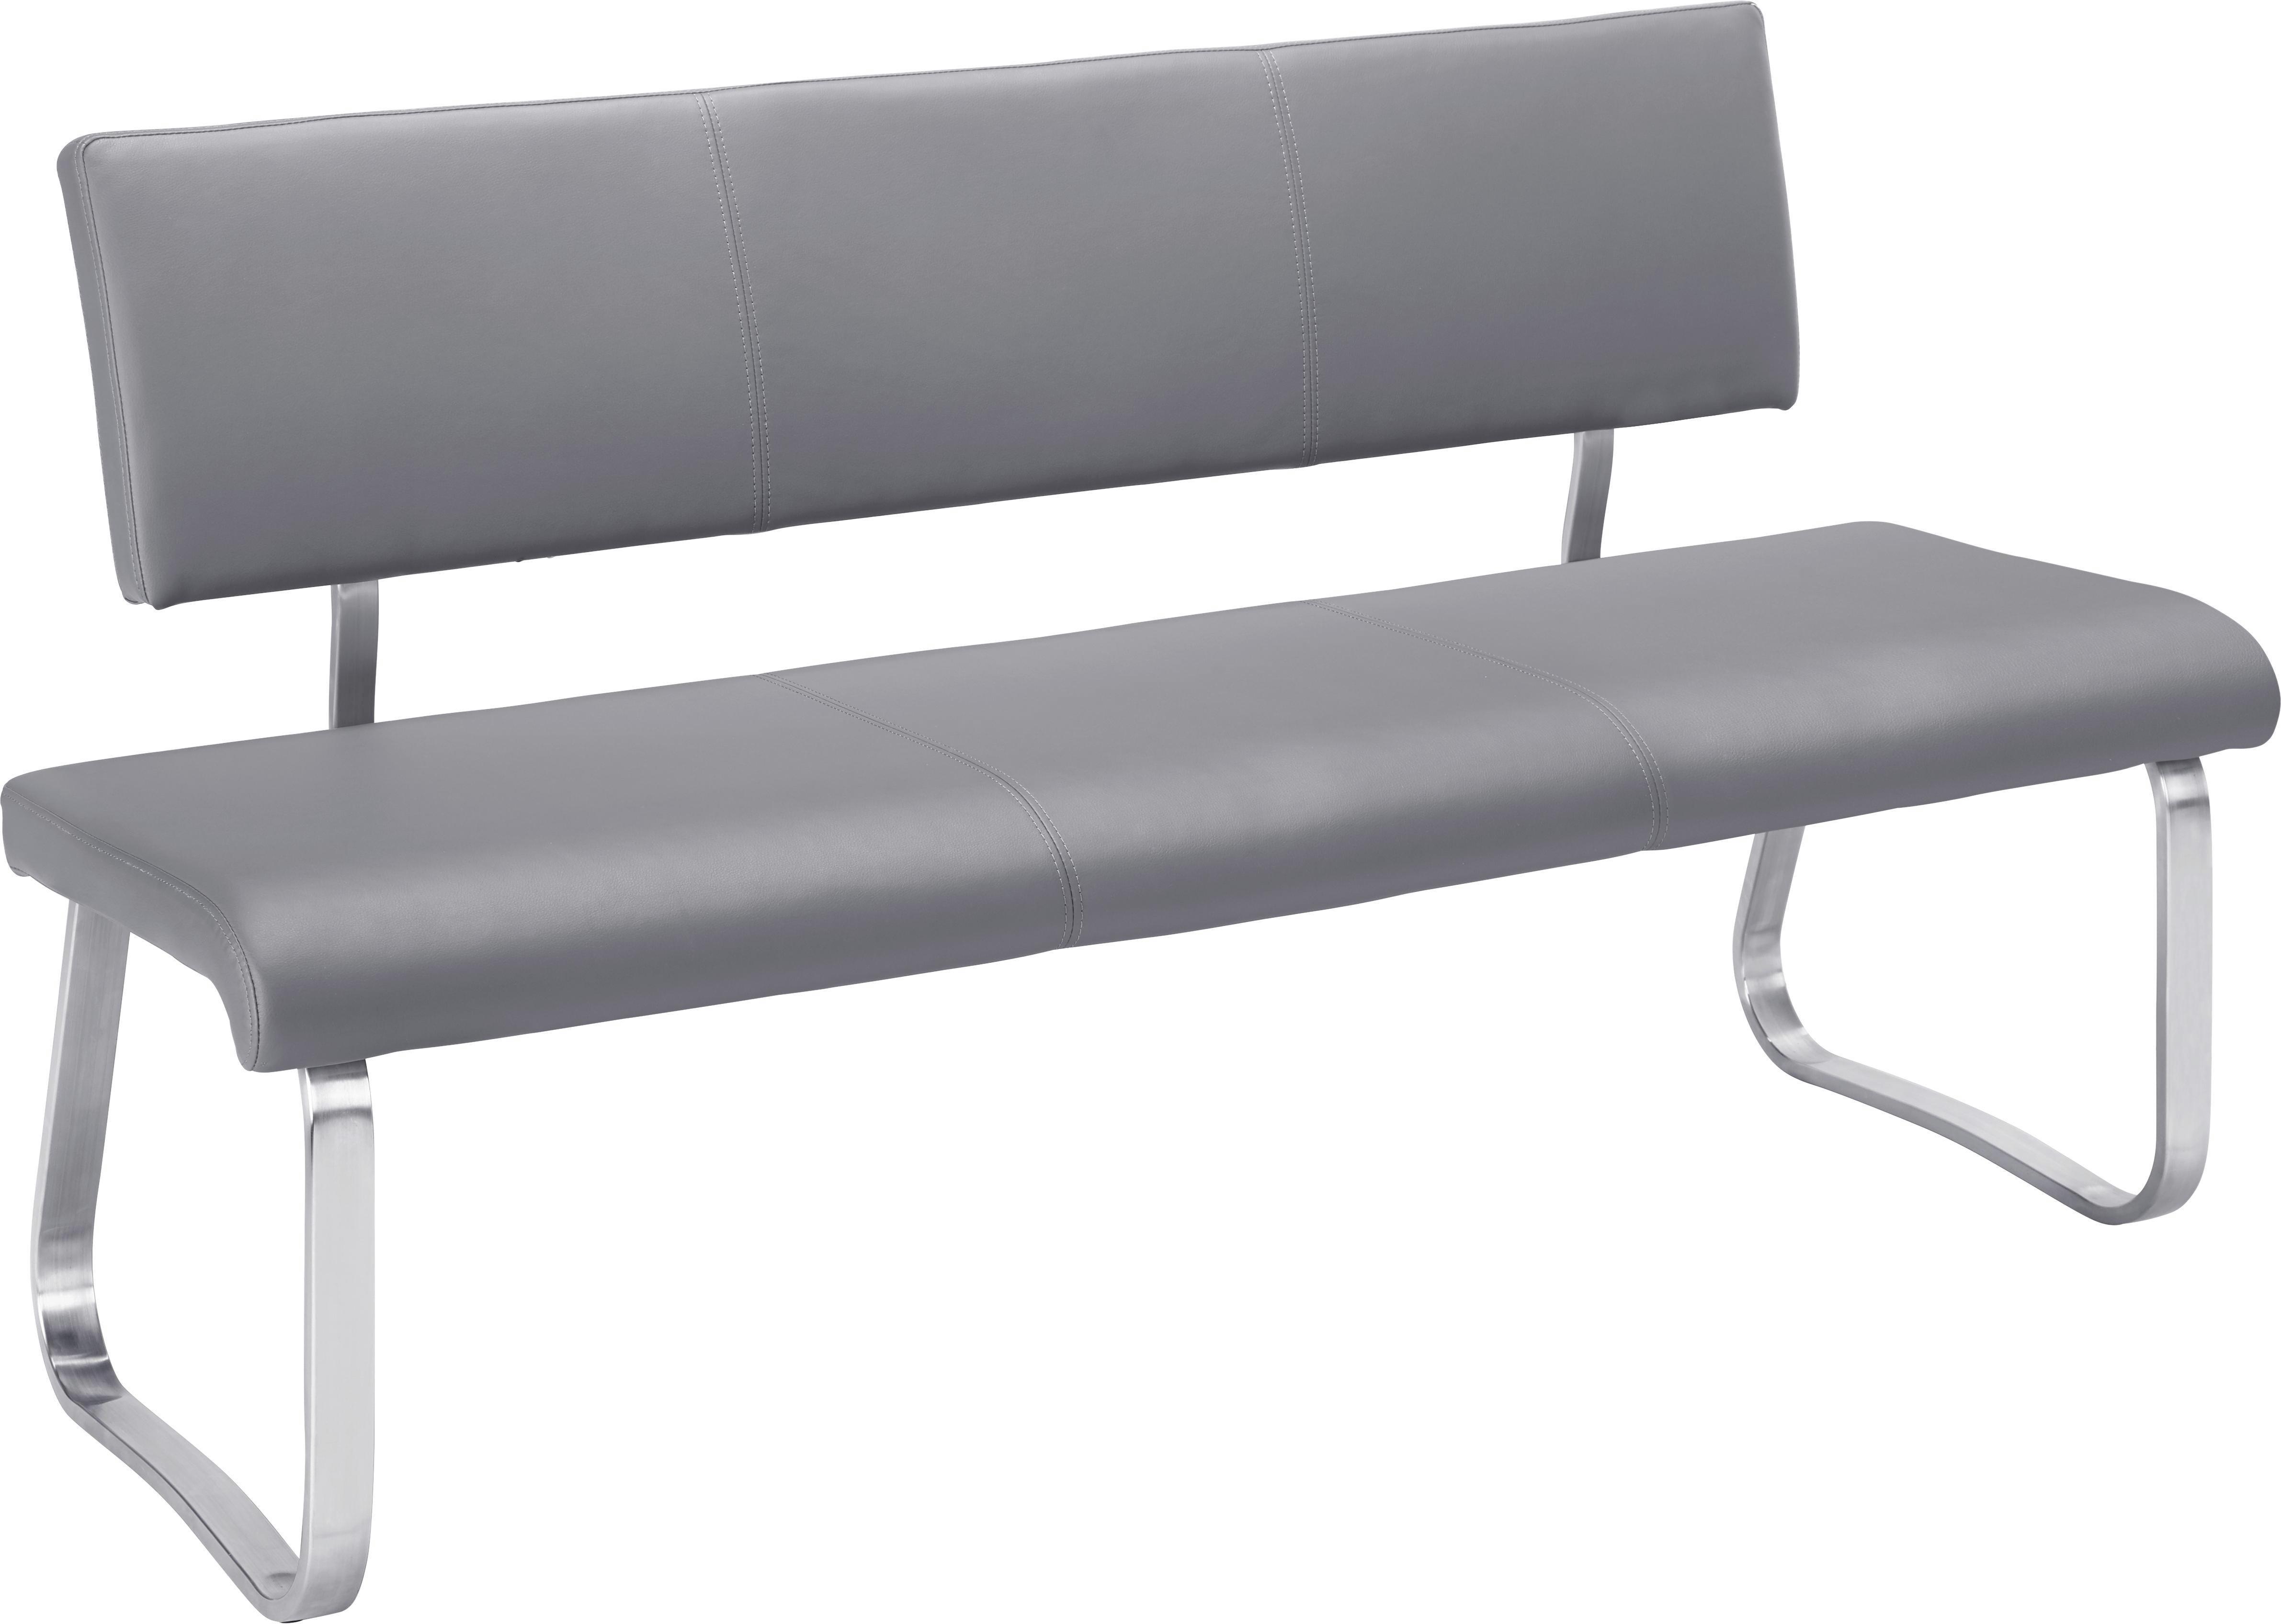 Sitzbank in Grau - Edelstahlfarben/Grau, MODERN, Textil/Metall (155/86/59cm) - PREMIUM LIVING